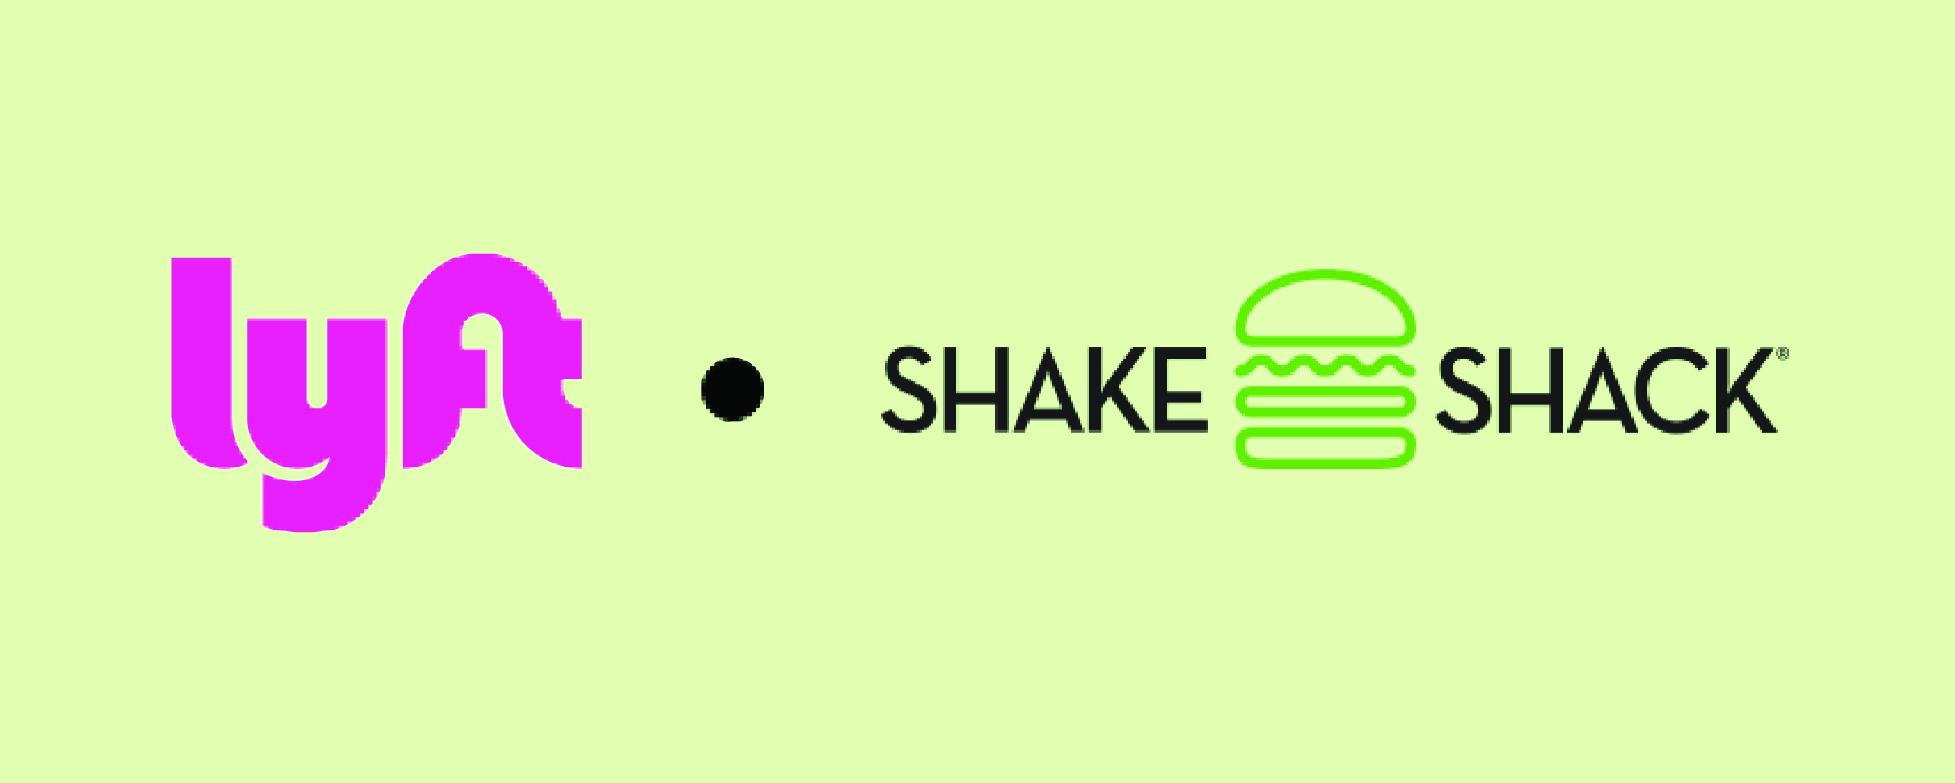 NYC: Get a Discounted Ride to a Free Shake at Shake Shack